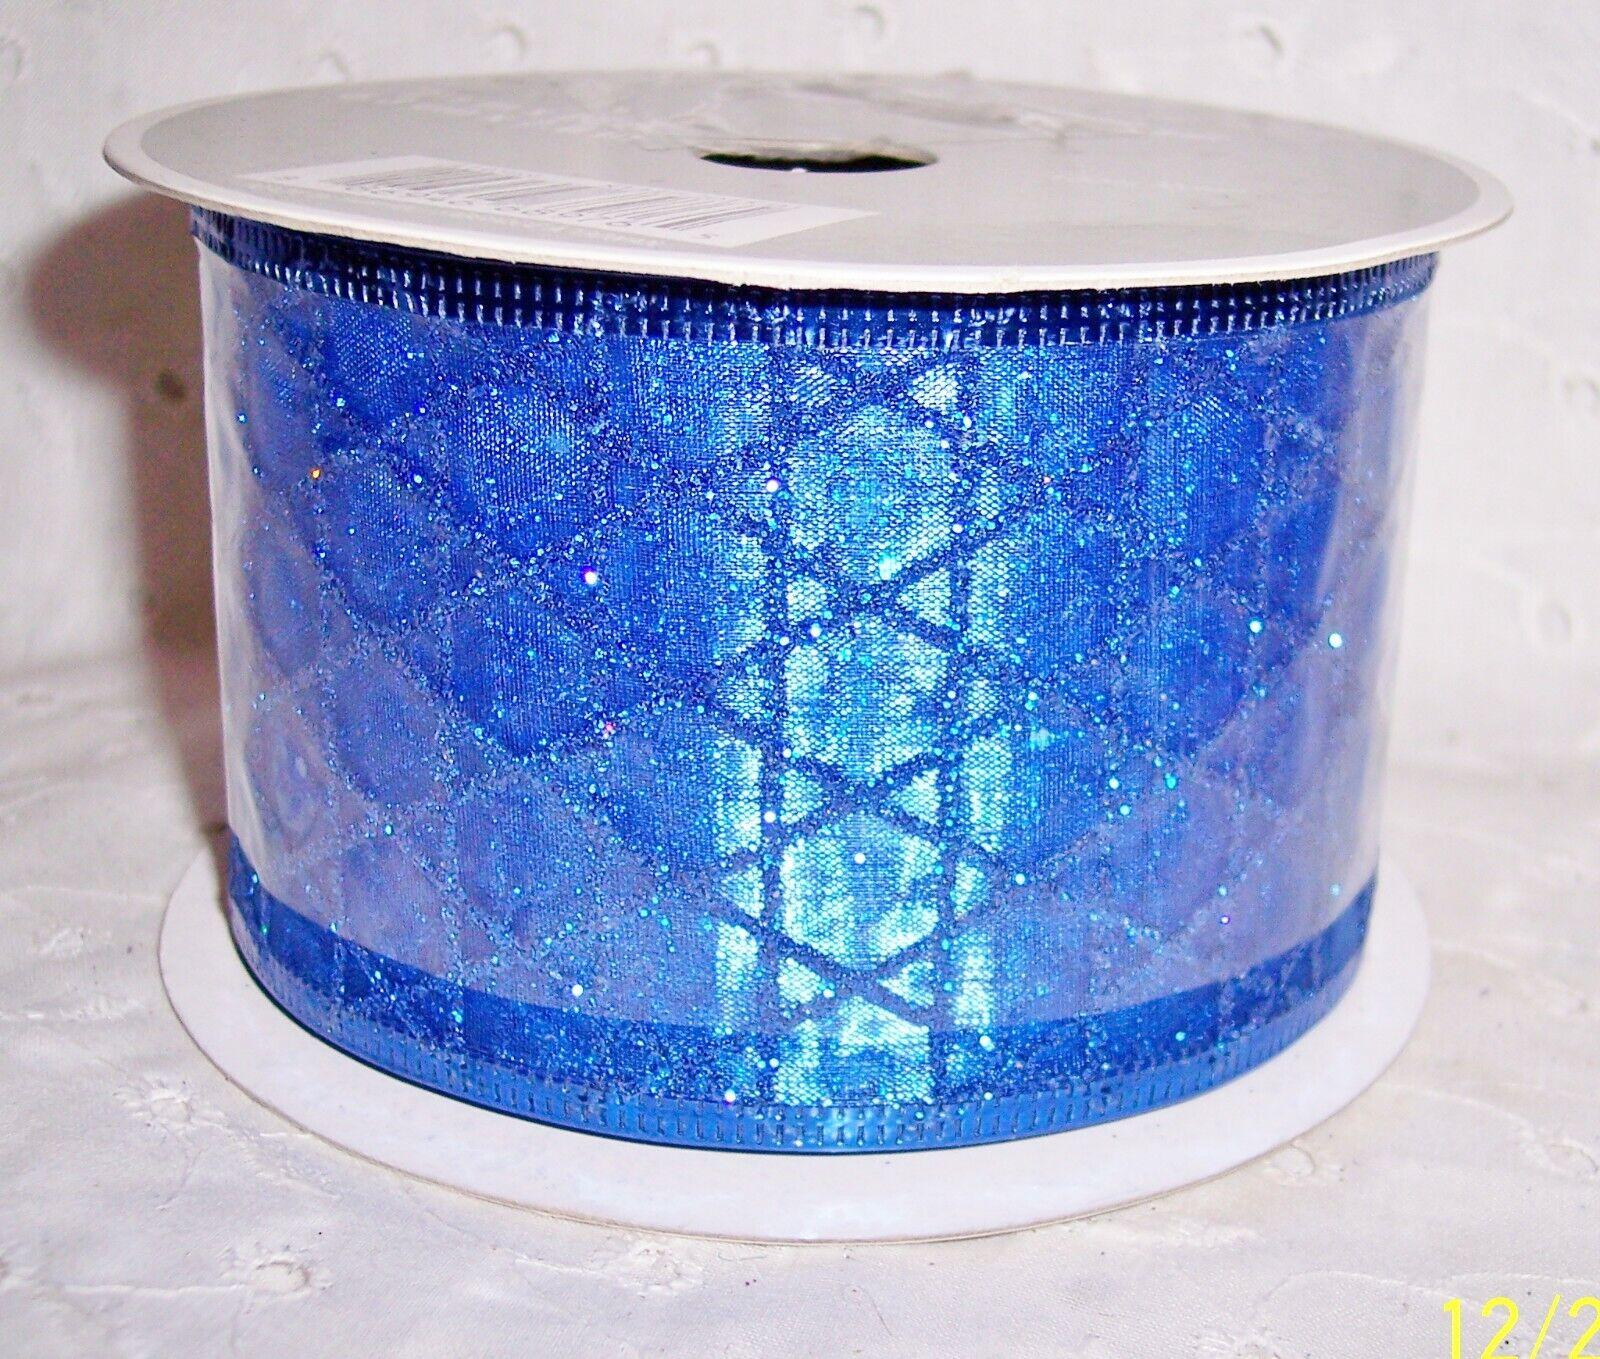 RIBBON WIRE-EDGED BLUE-ORANGE-RED-PURPLE CRAFTS U CHOOSE COLOR - $2.75